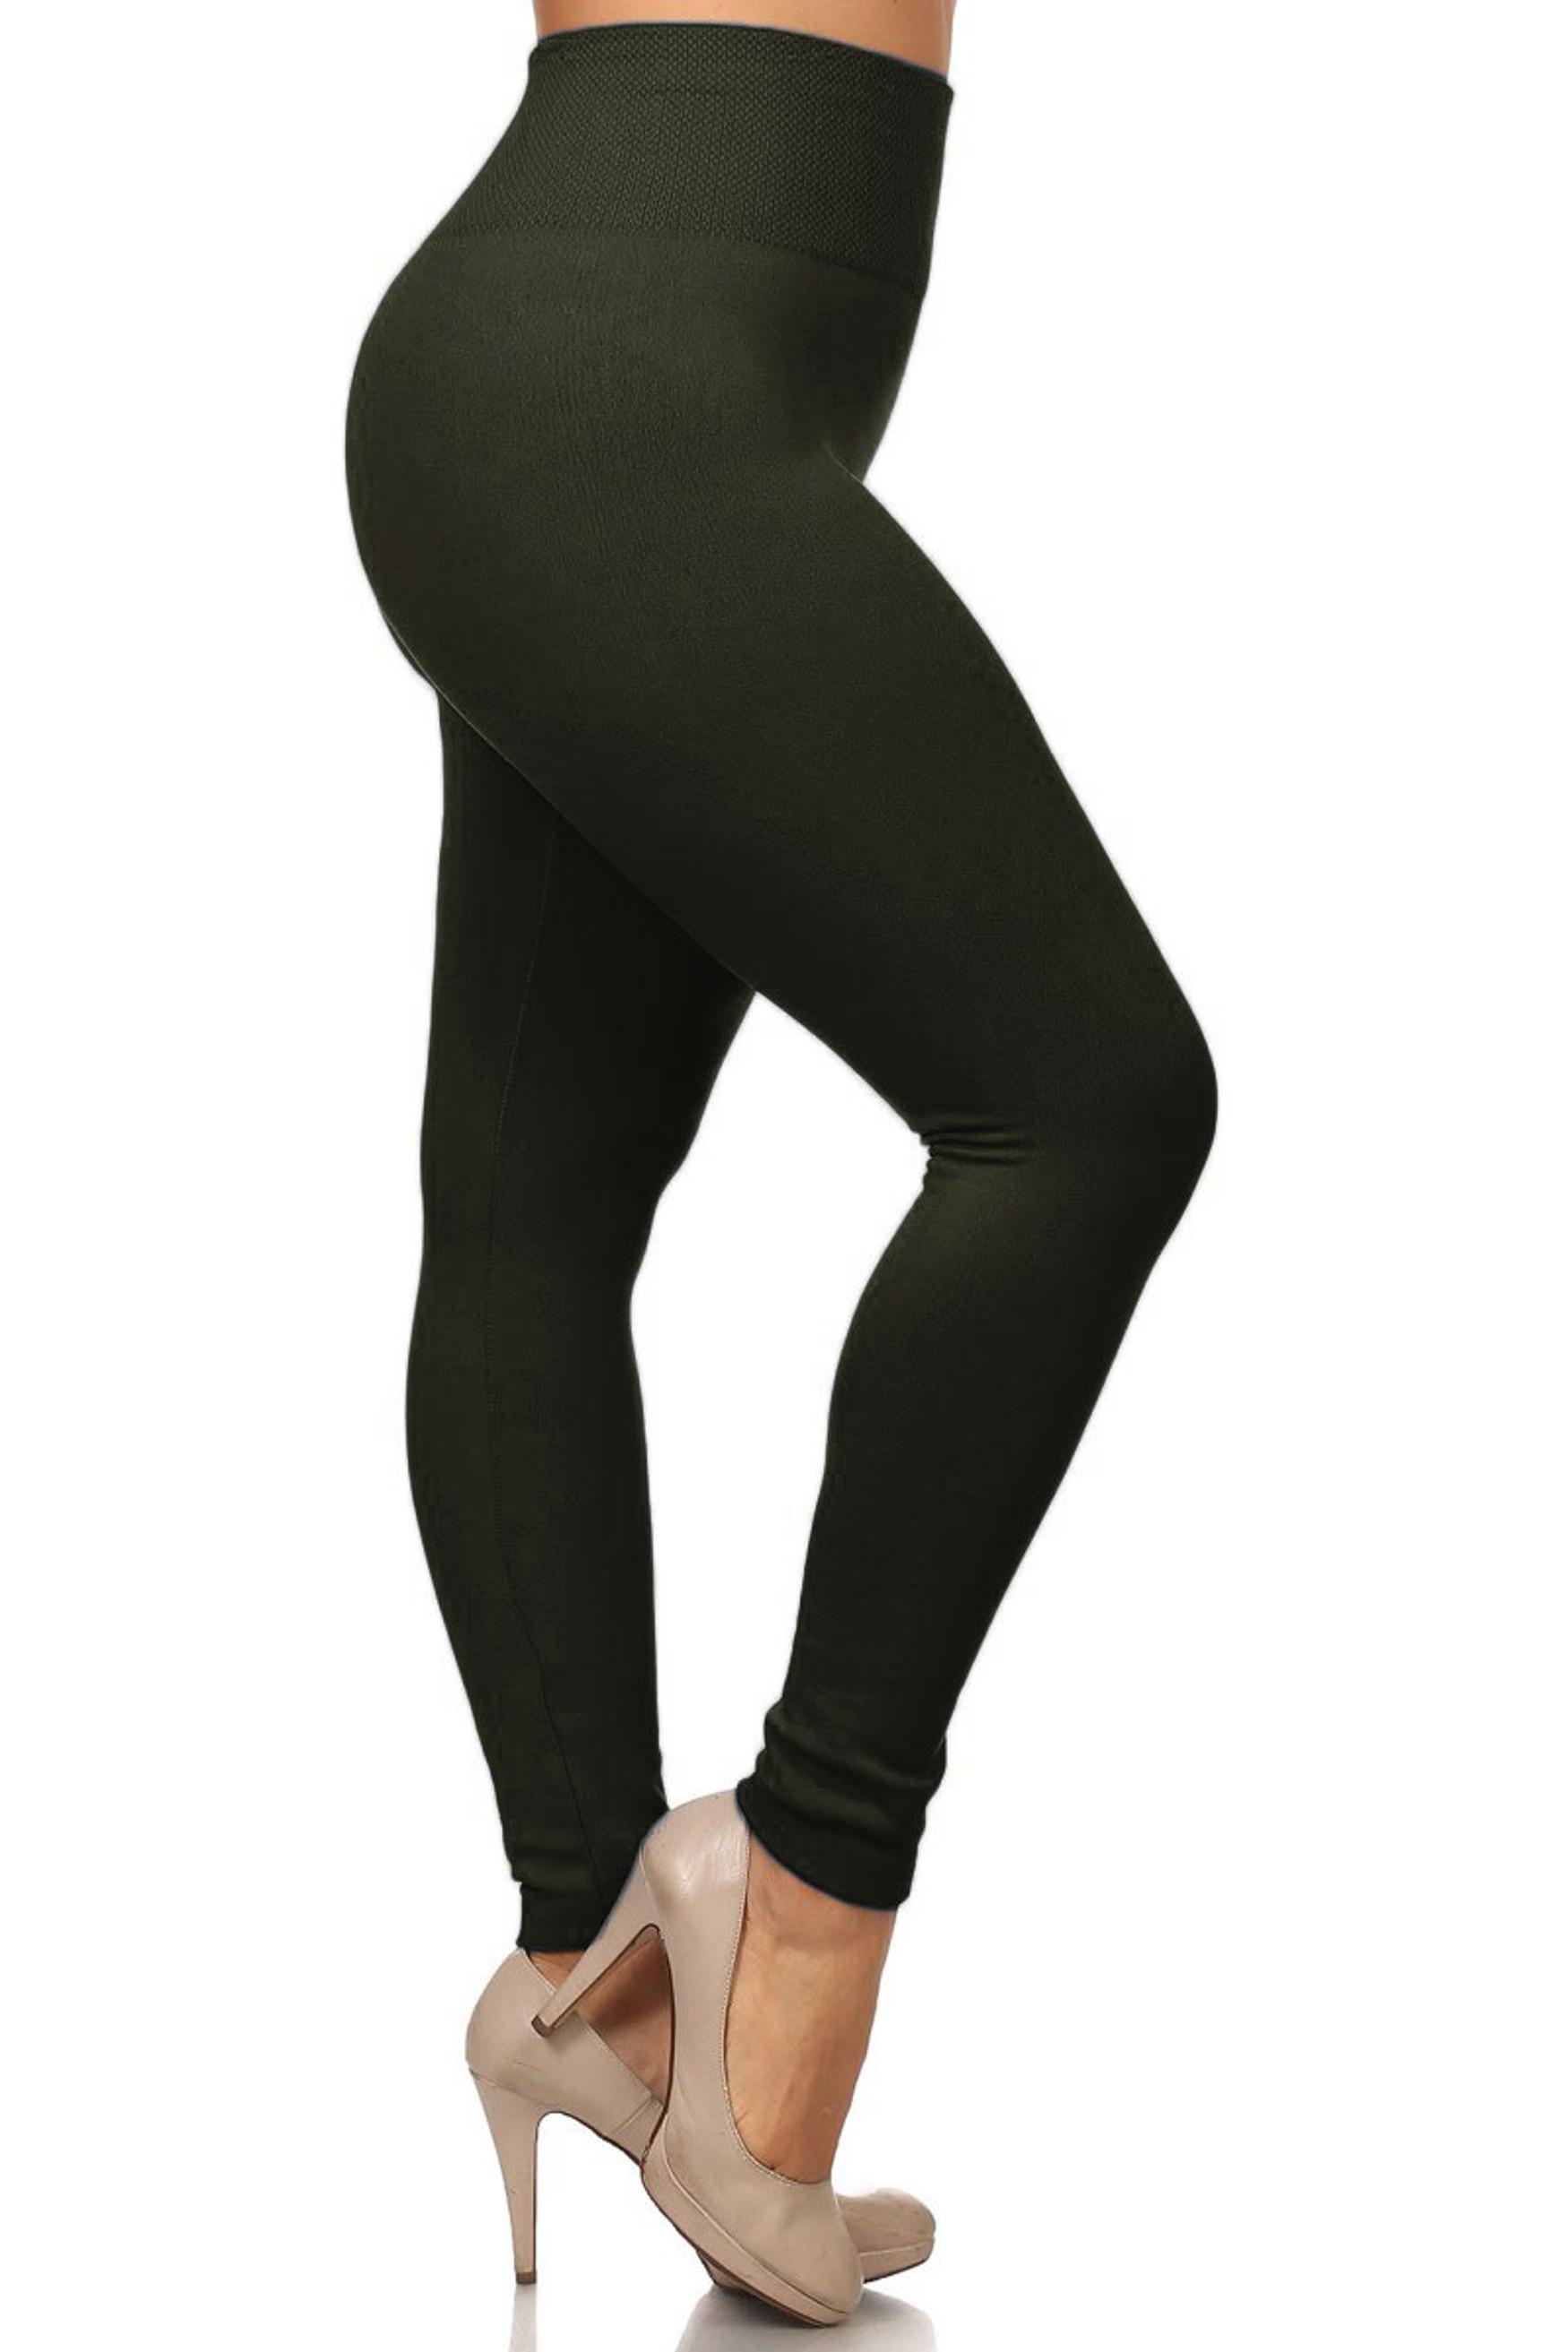 High Waist Thick Fleece Lined Plus Size Leggings